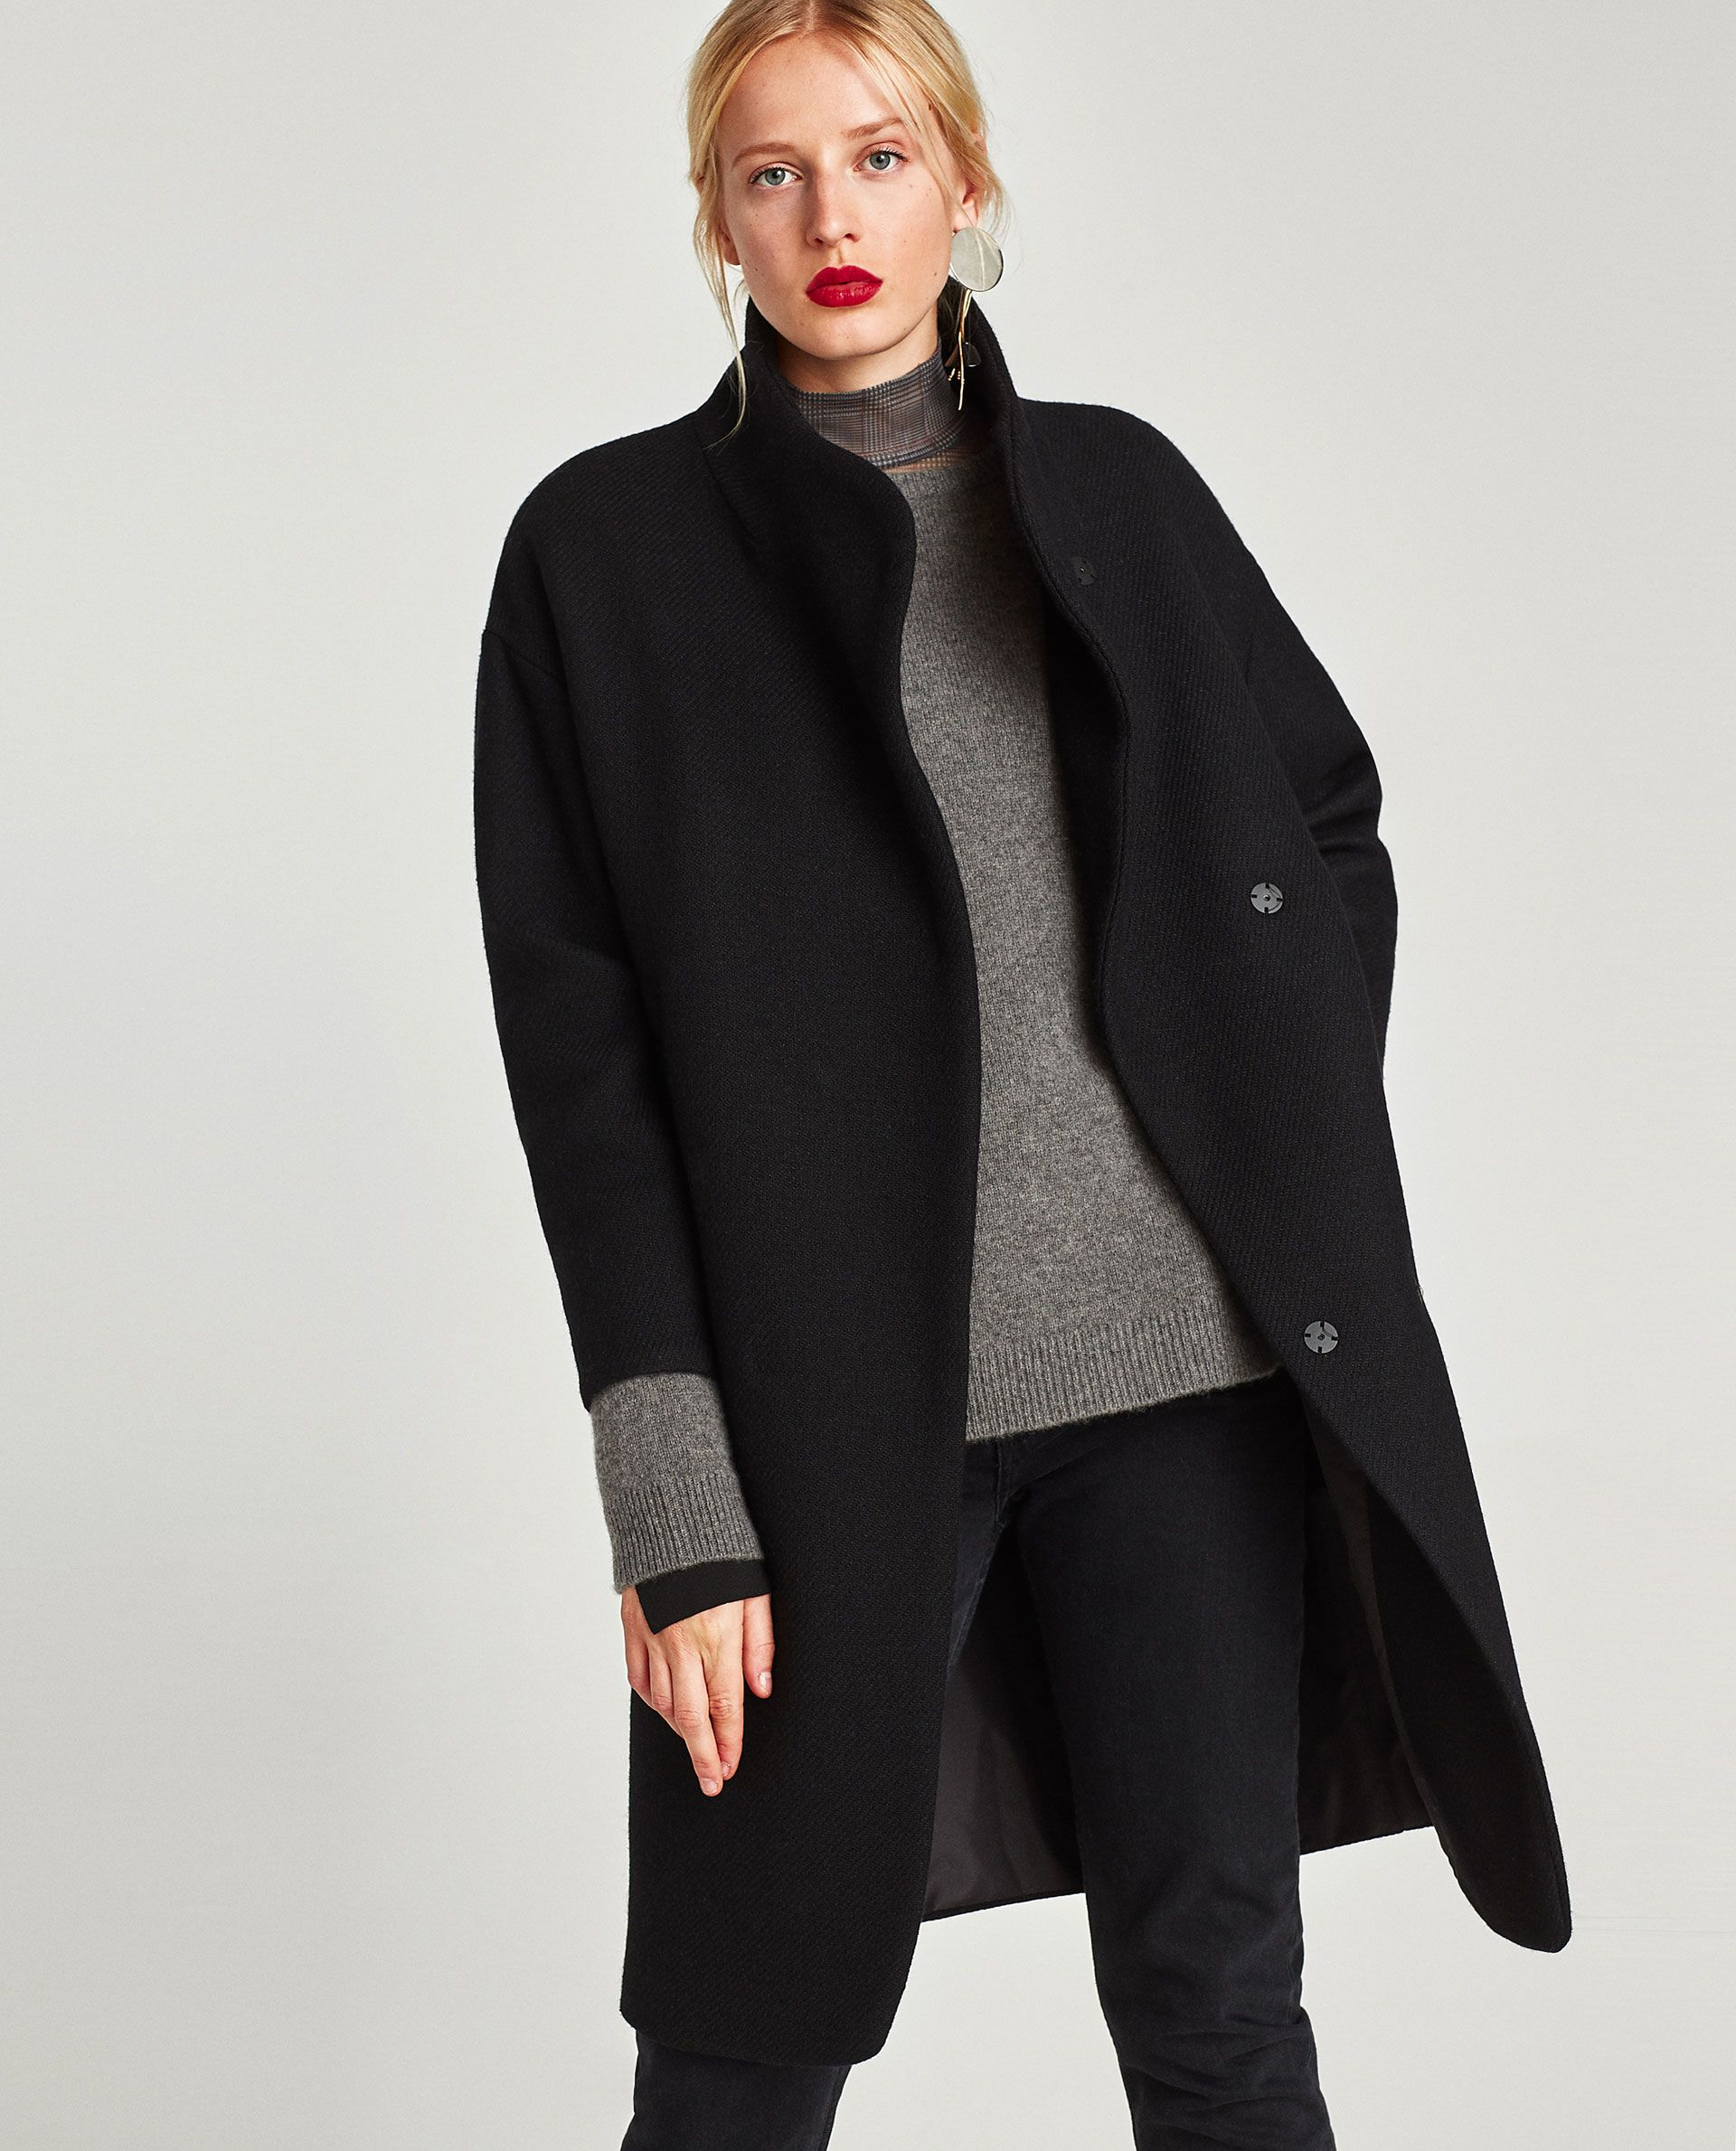 cd5410cf14 LONG COAT WITH WRAPAROUND COLLAR | Zara 2017 in 2019 | Coat, Wrap ...